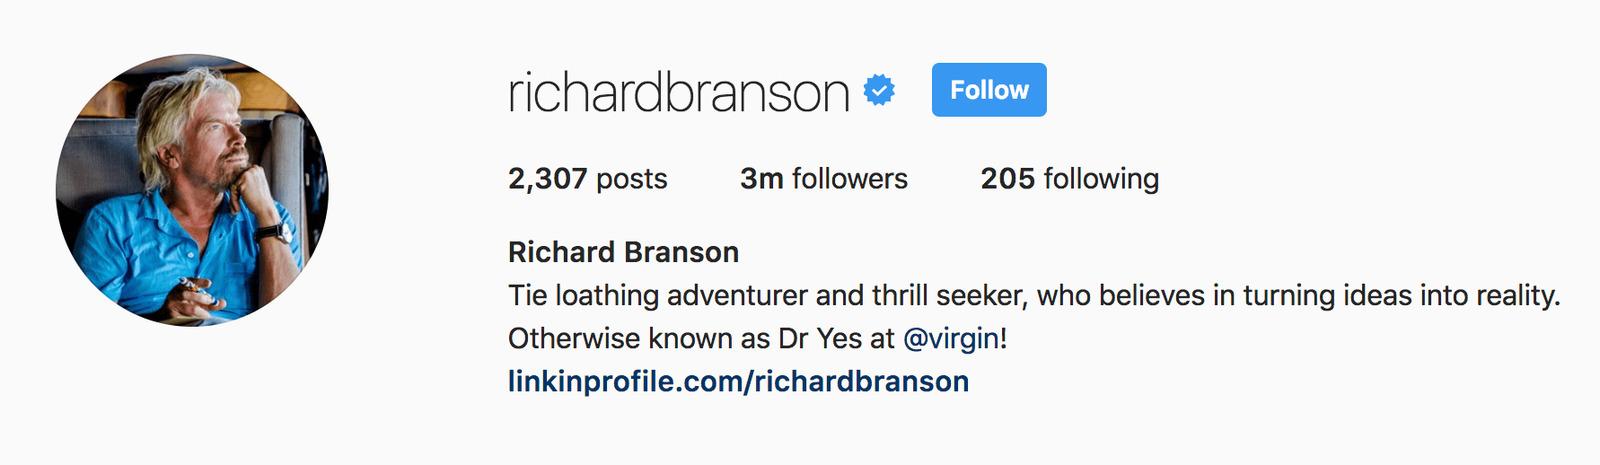 richard-branson-instagram-bio.png